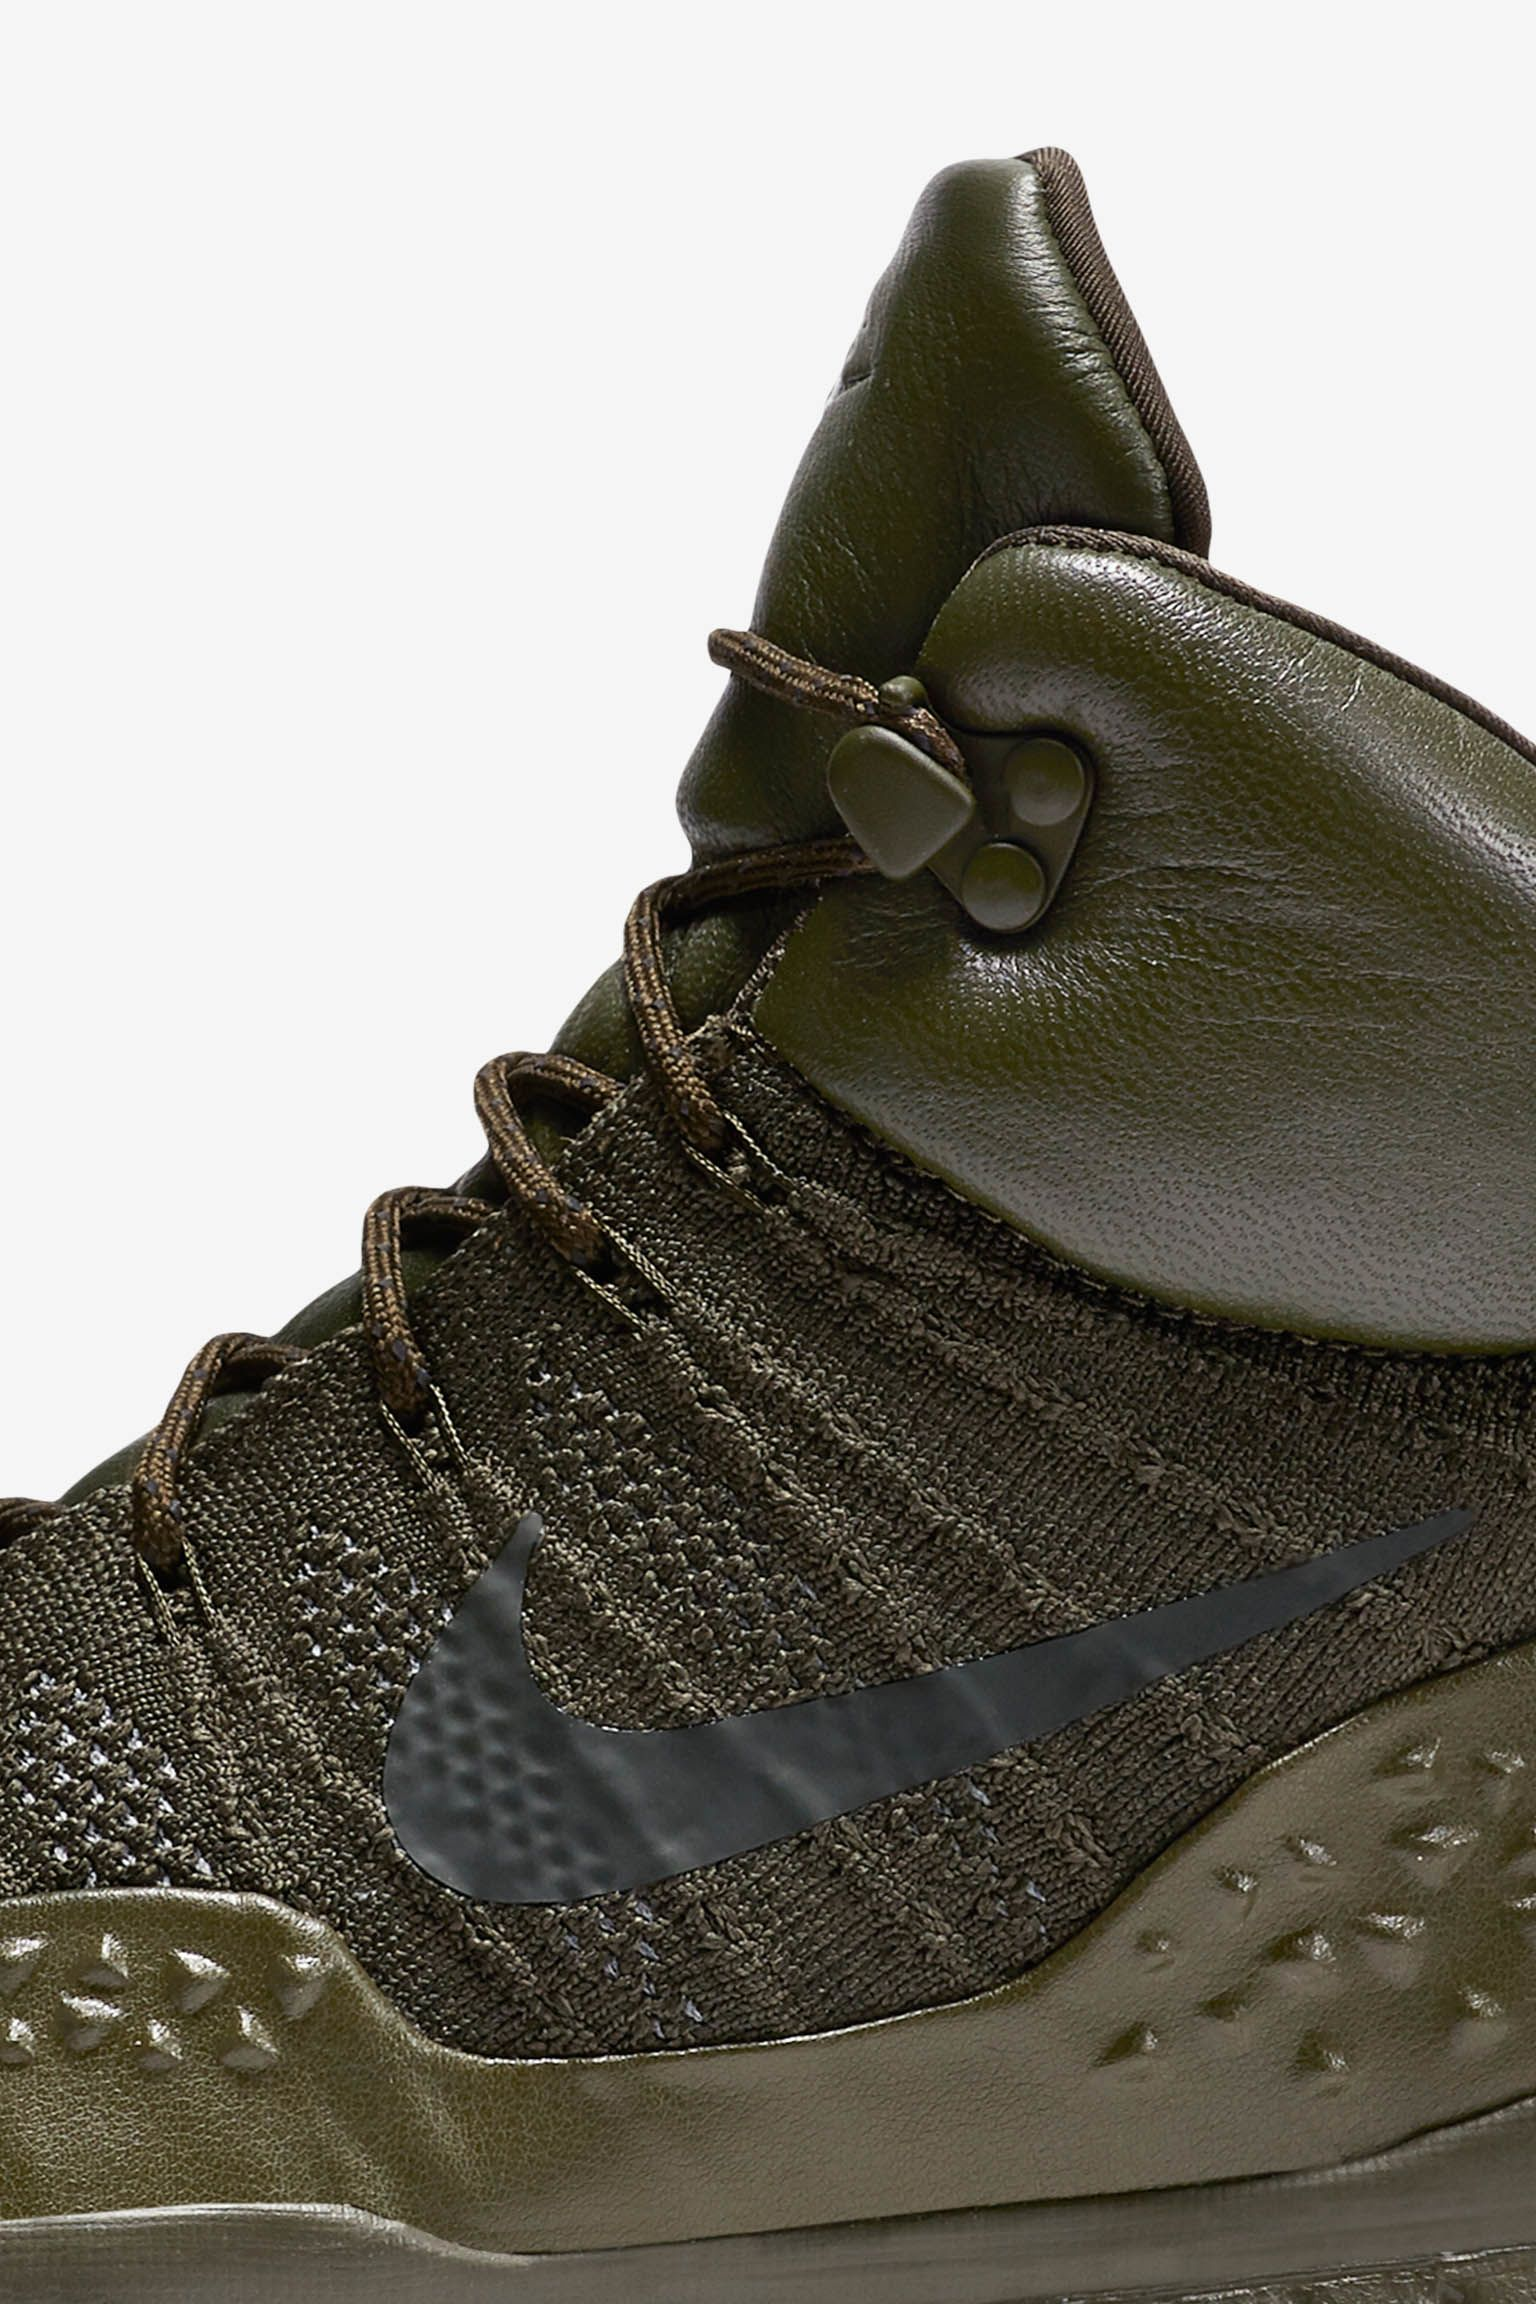 Nike Lupinek Flyknit Sneakerboot 'Black & Anthracite'. Release Date